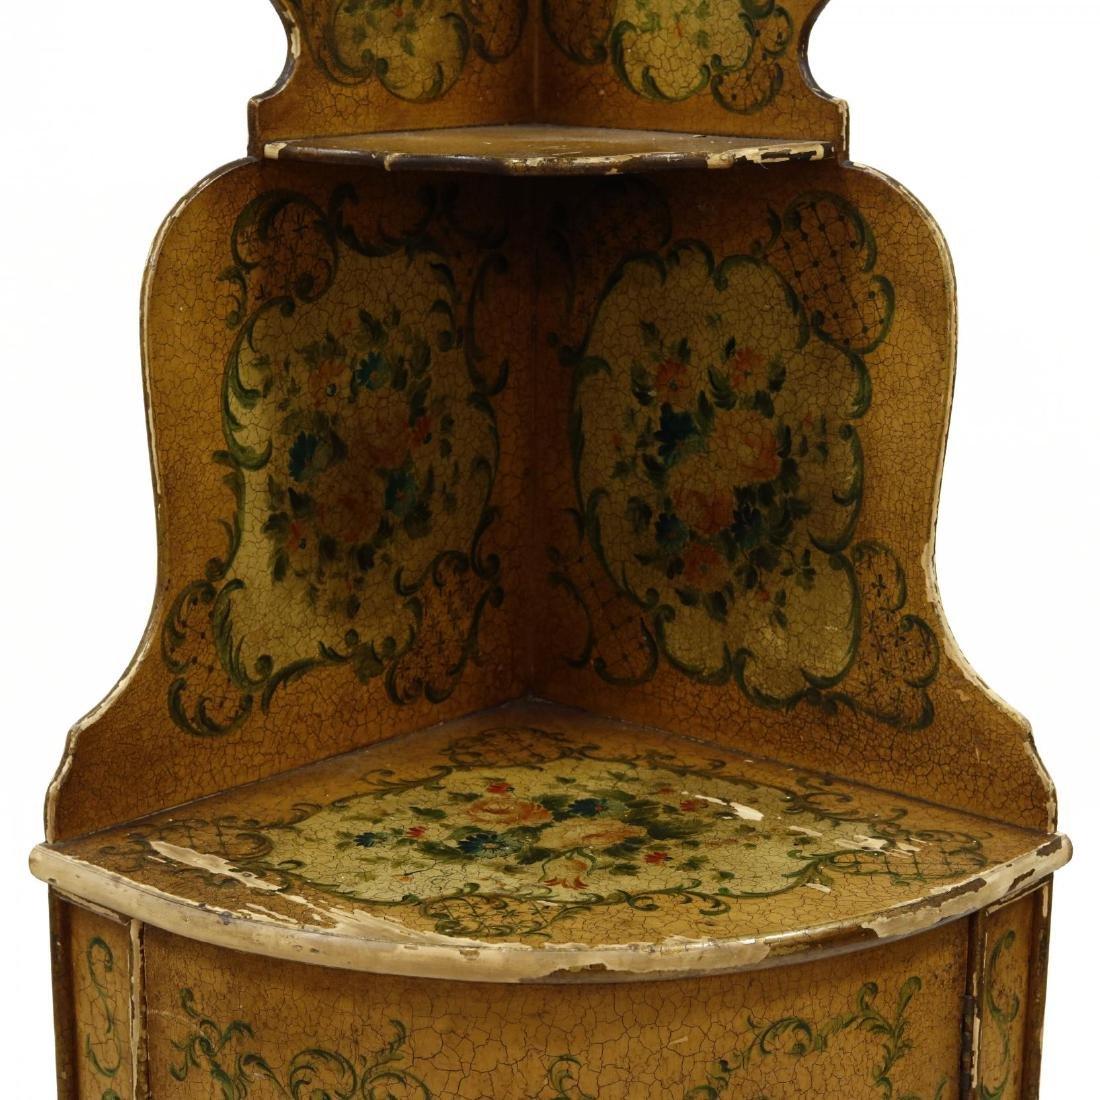 Century Furniture Co., Italianate Painted Diminutive - 3